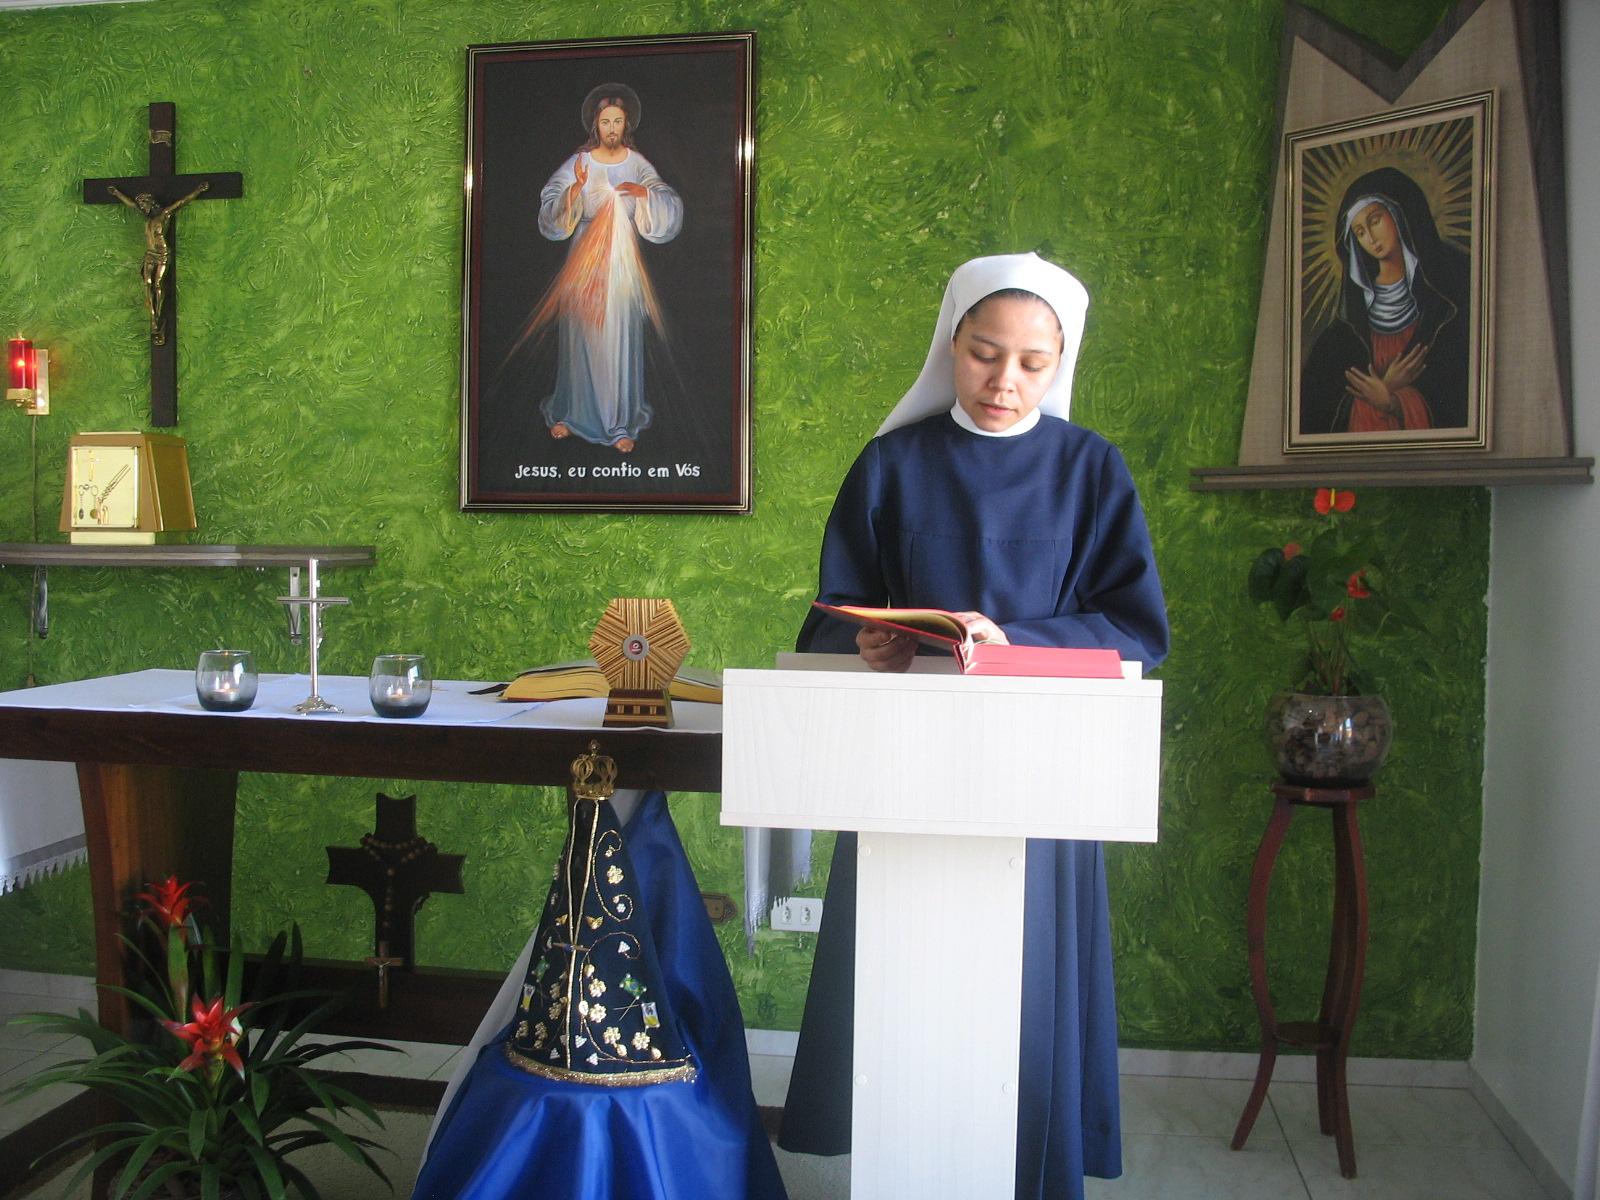 Fotos da missa da festa de Faustina 05-10 008